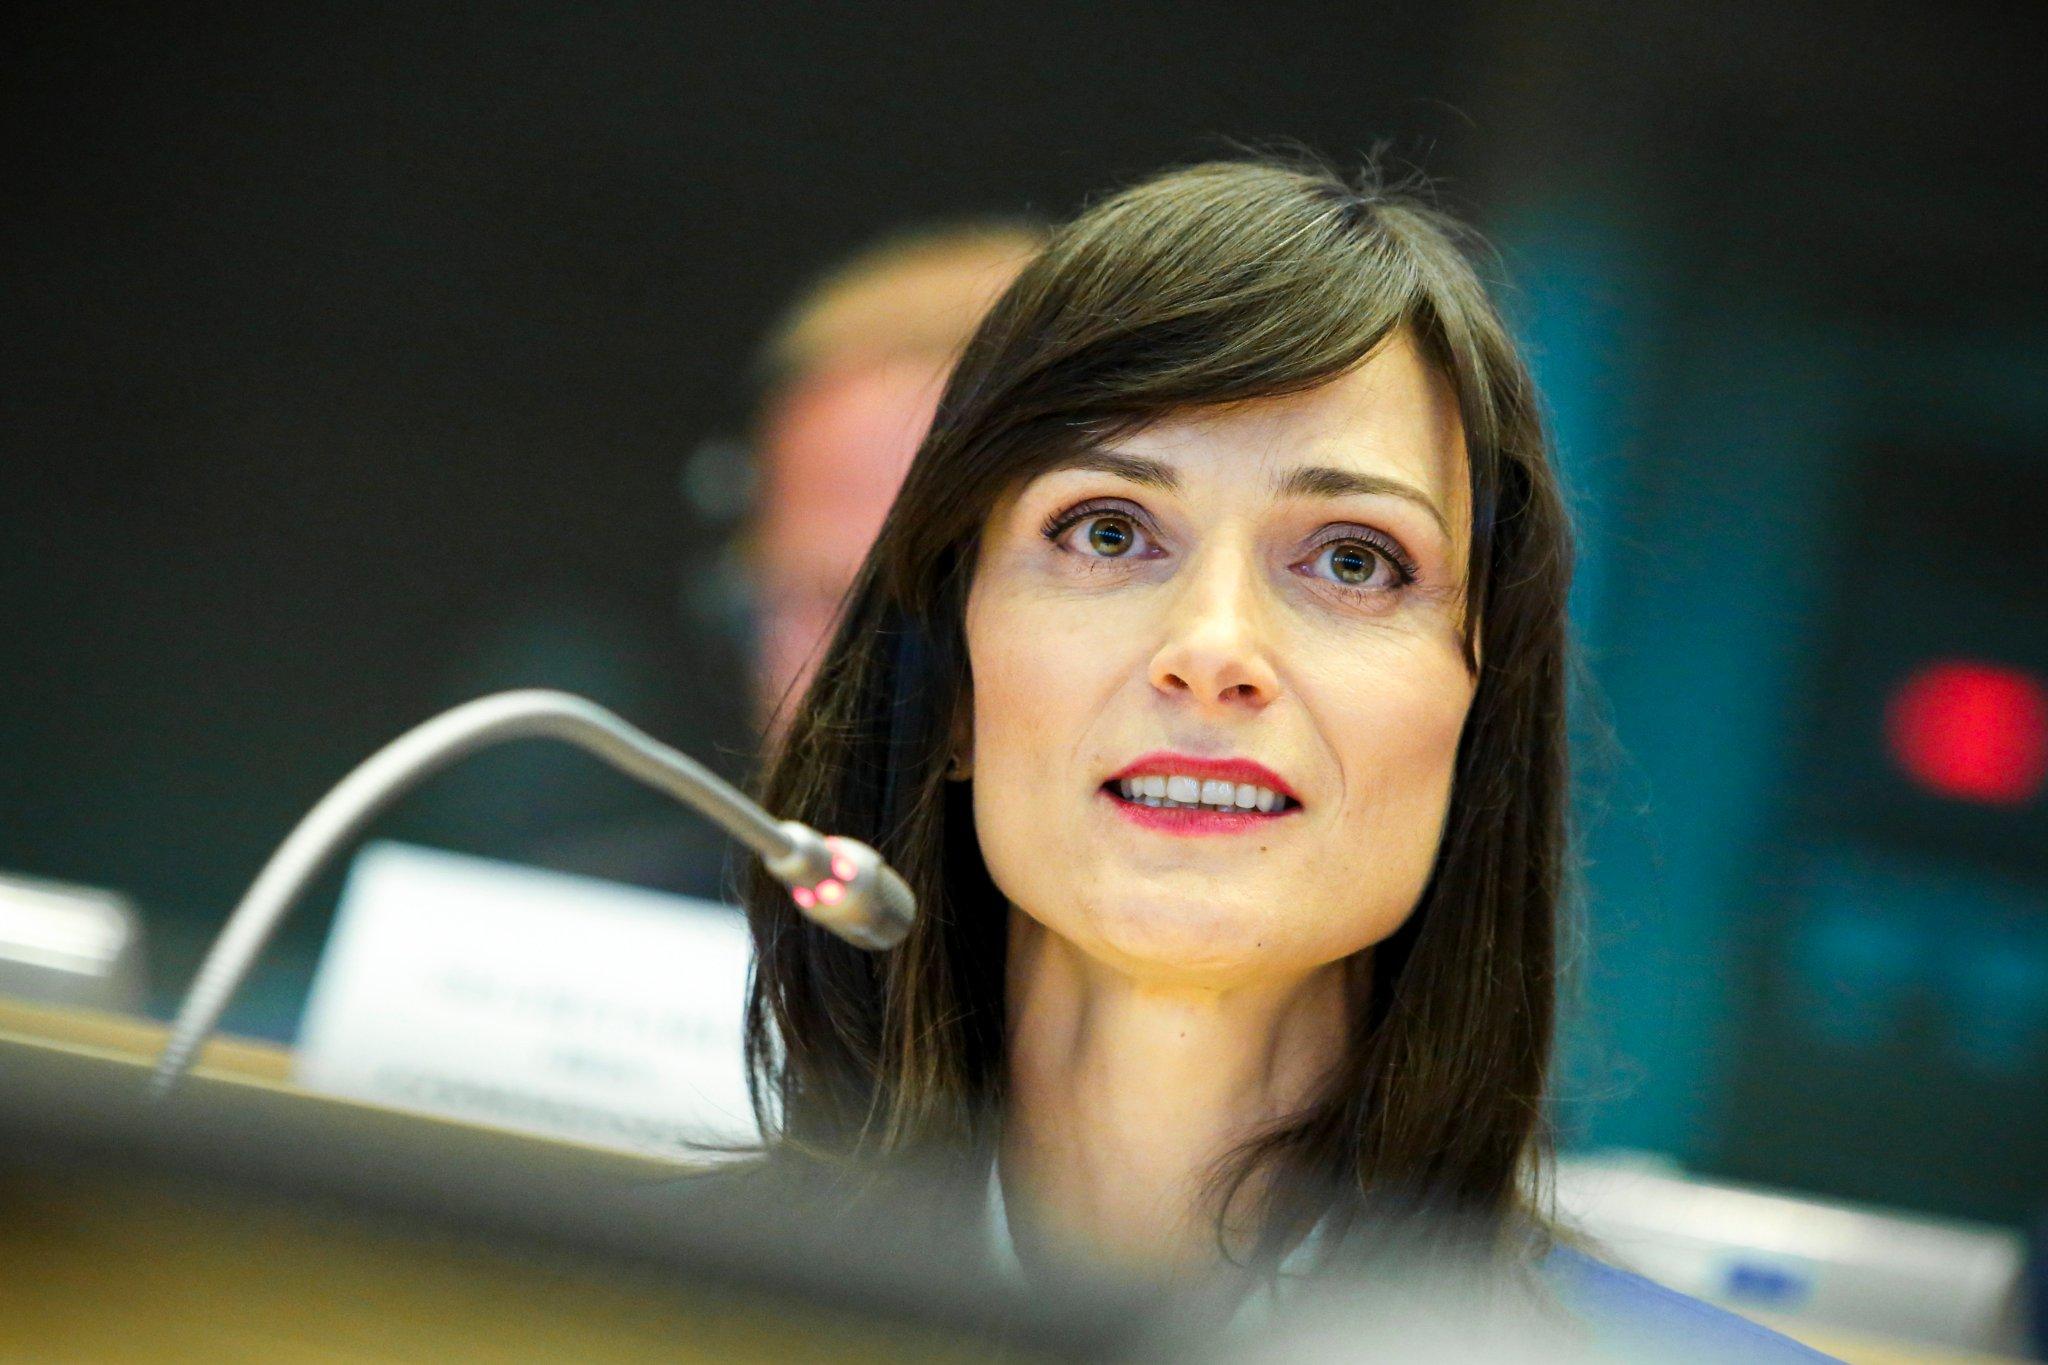 Marija Gabrielová